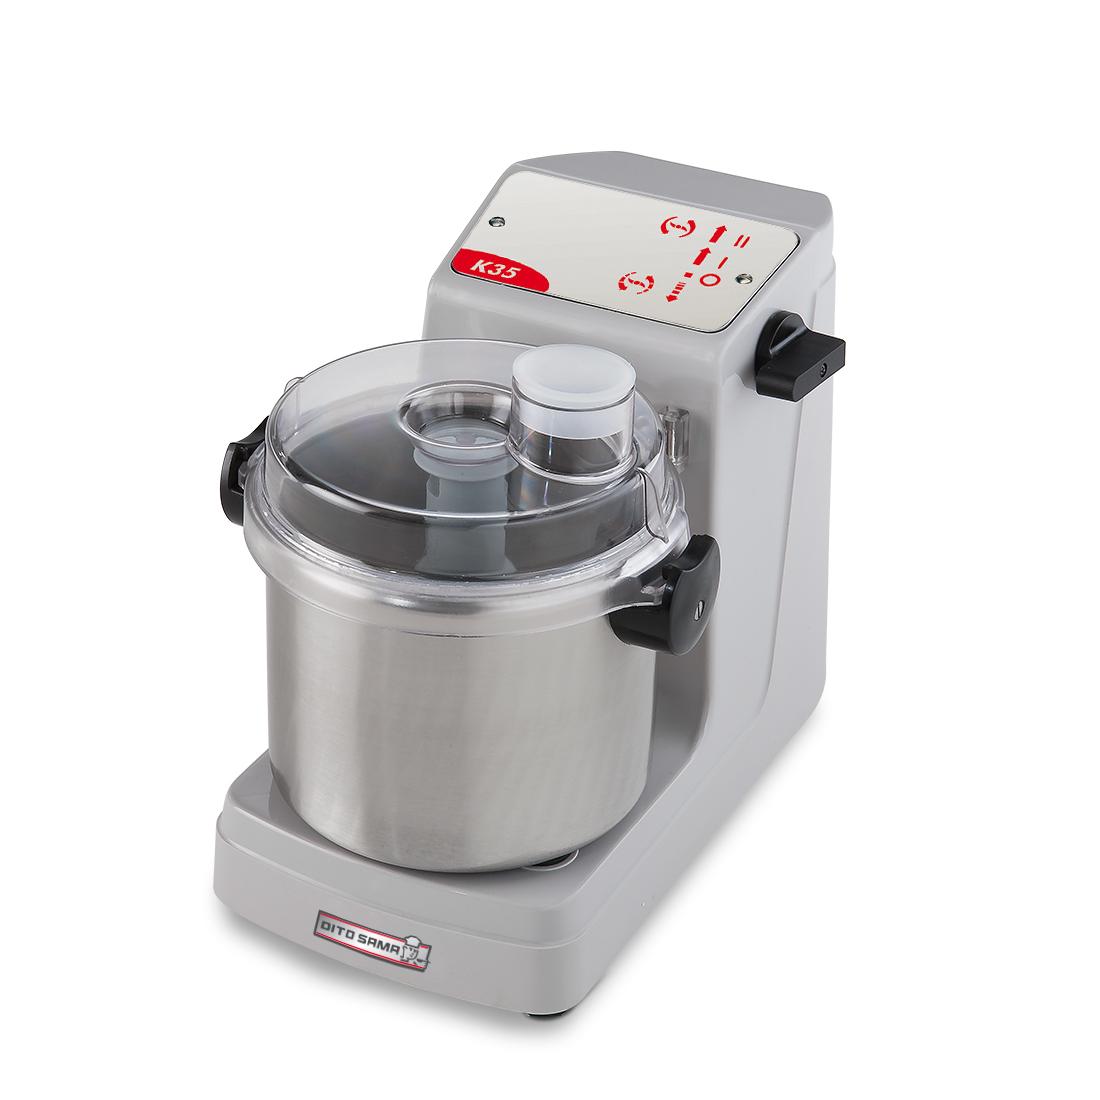 Dito Sama Food processor 3.5 litre single speed 500w - K35